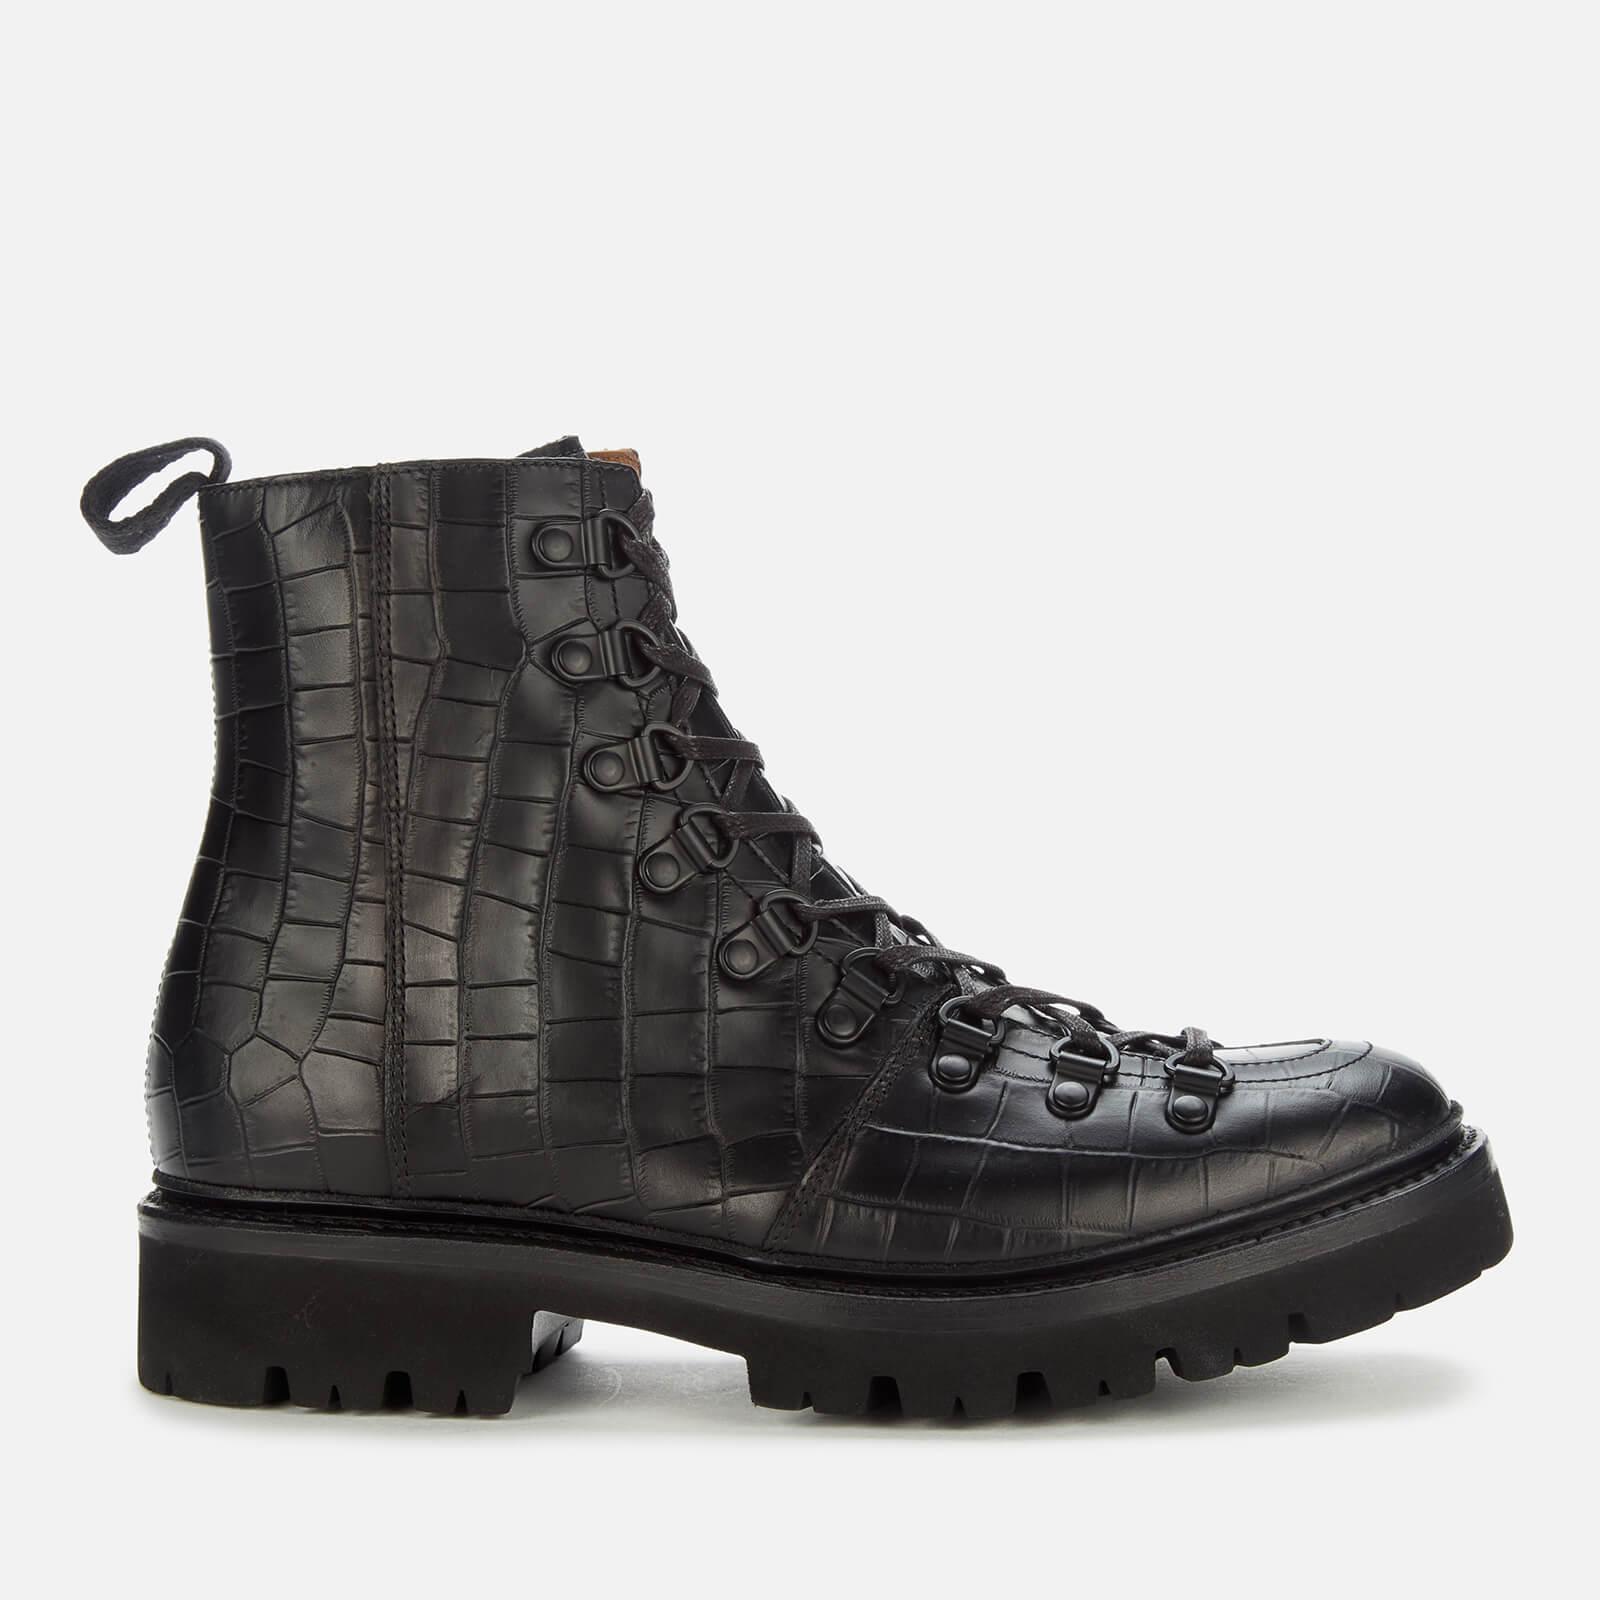 Grenson Women's Nanette Croc Print Hiking Style Boots - Black - Uk 4